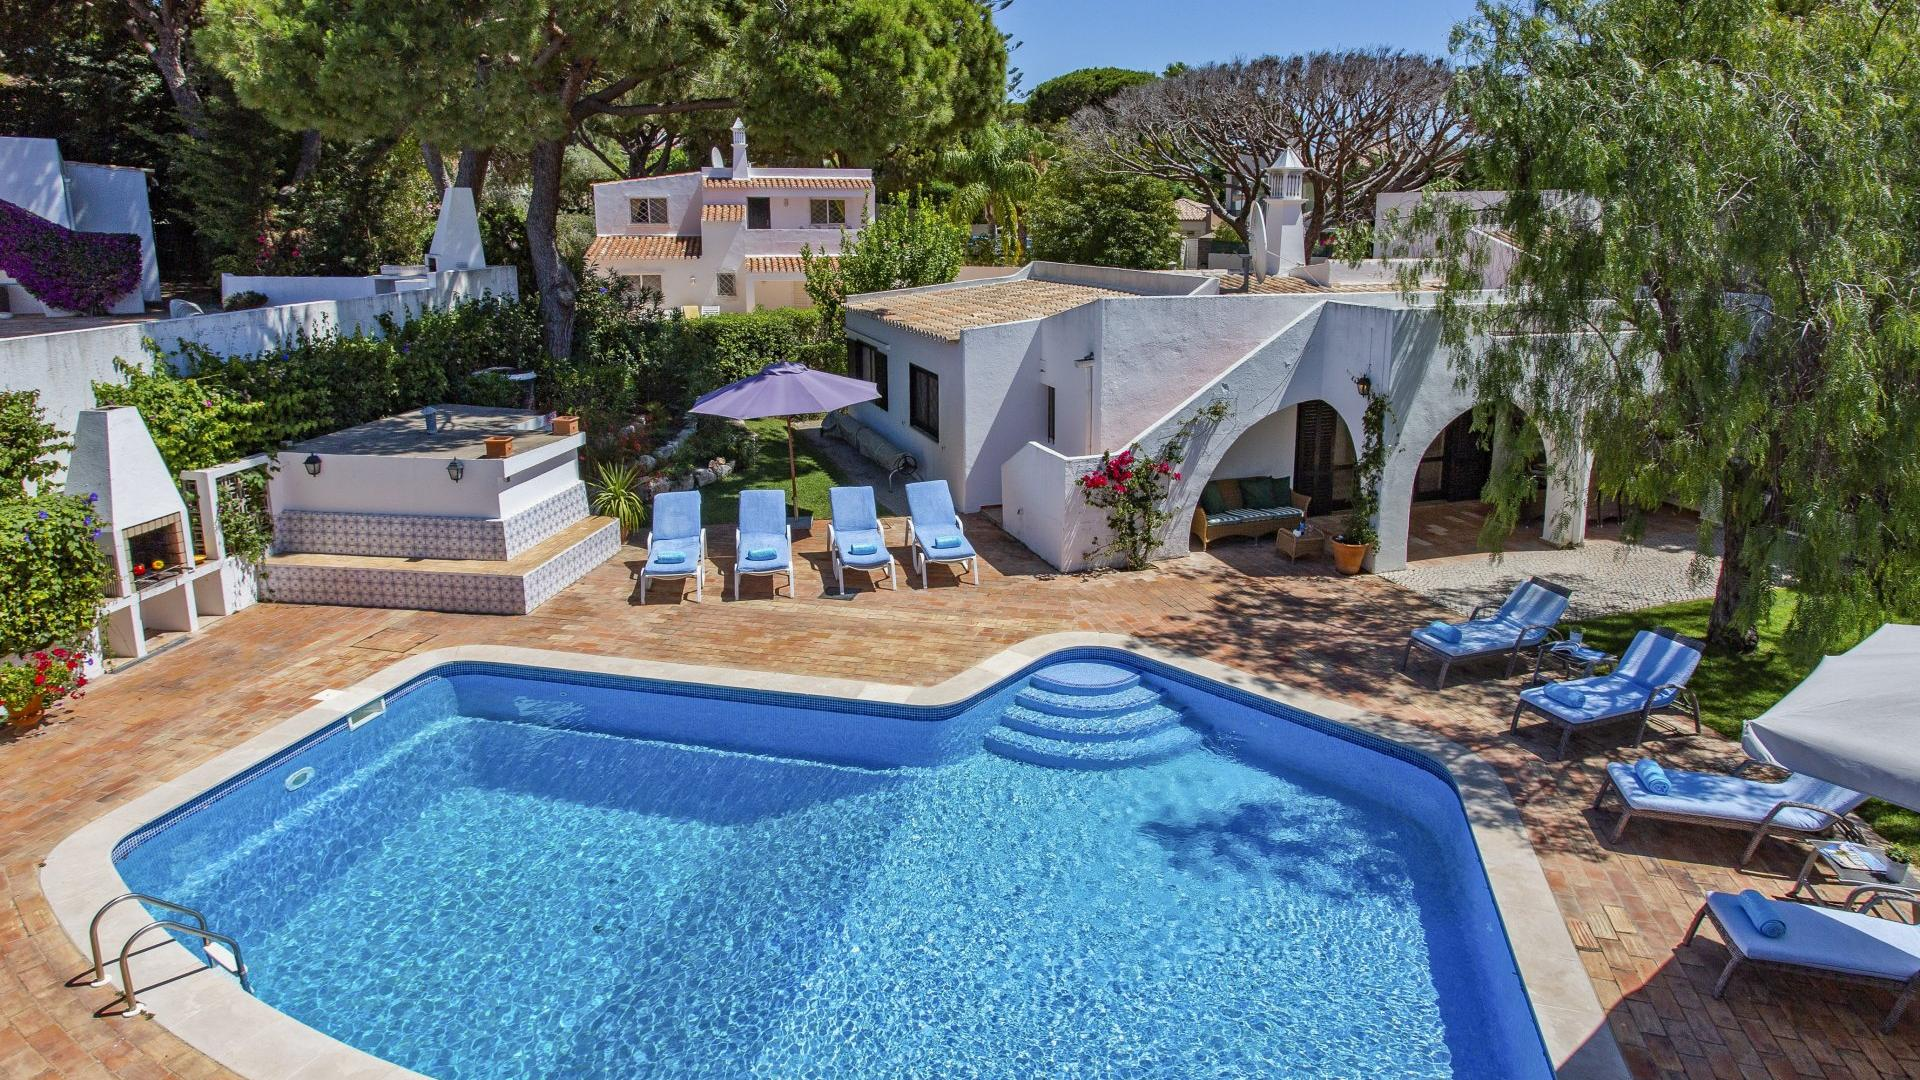 Villa Onda - Vale do Lobo, Algarve - Villa_Onda_Exterior_1.jpg